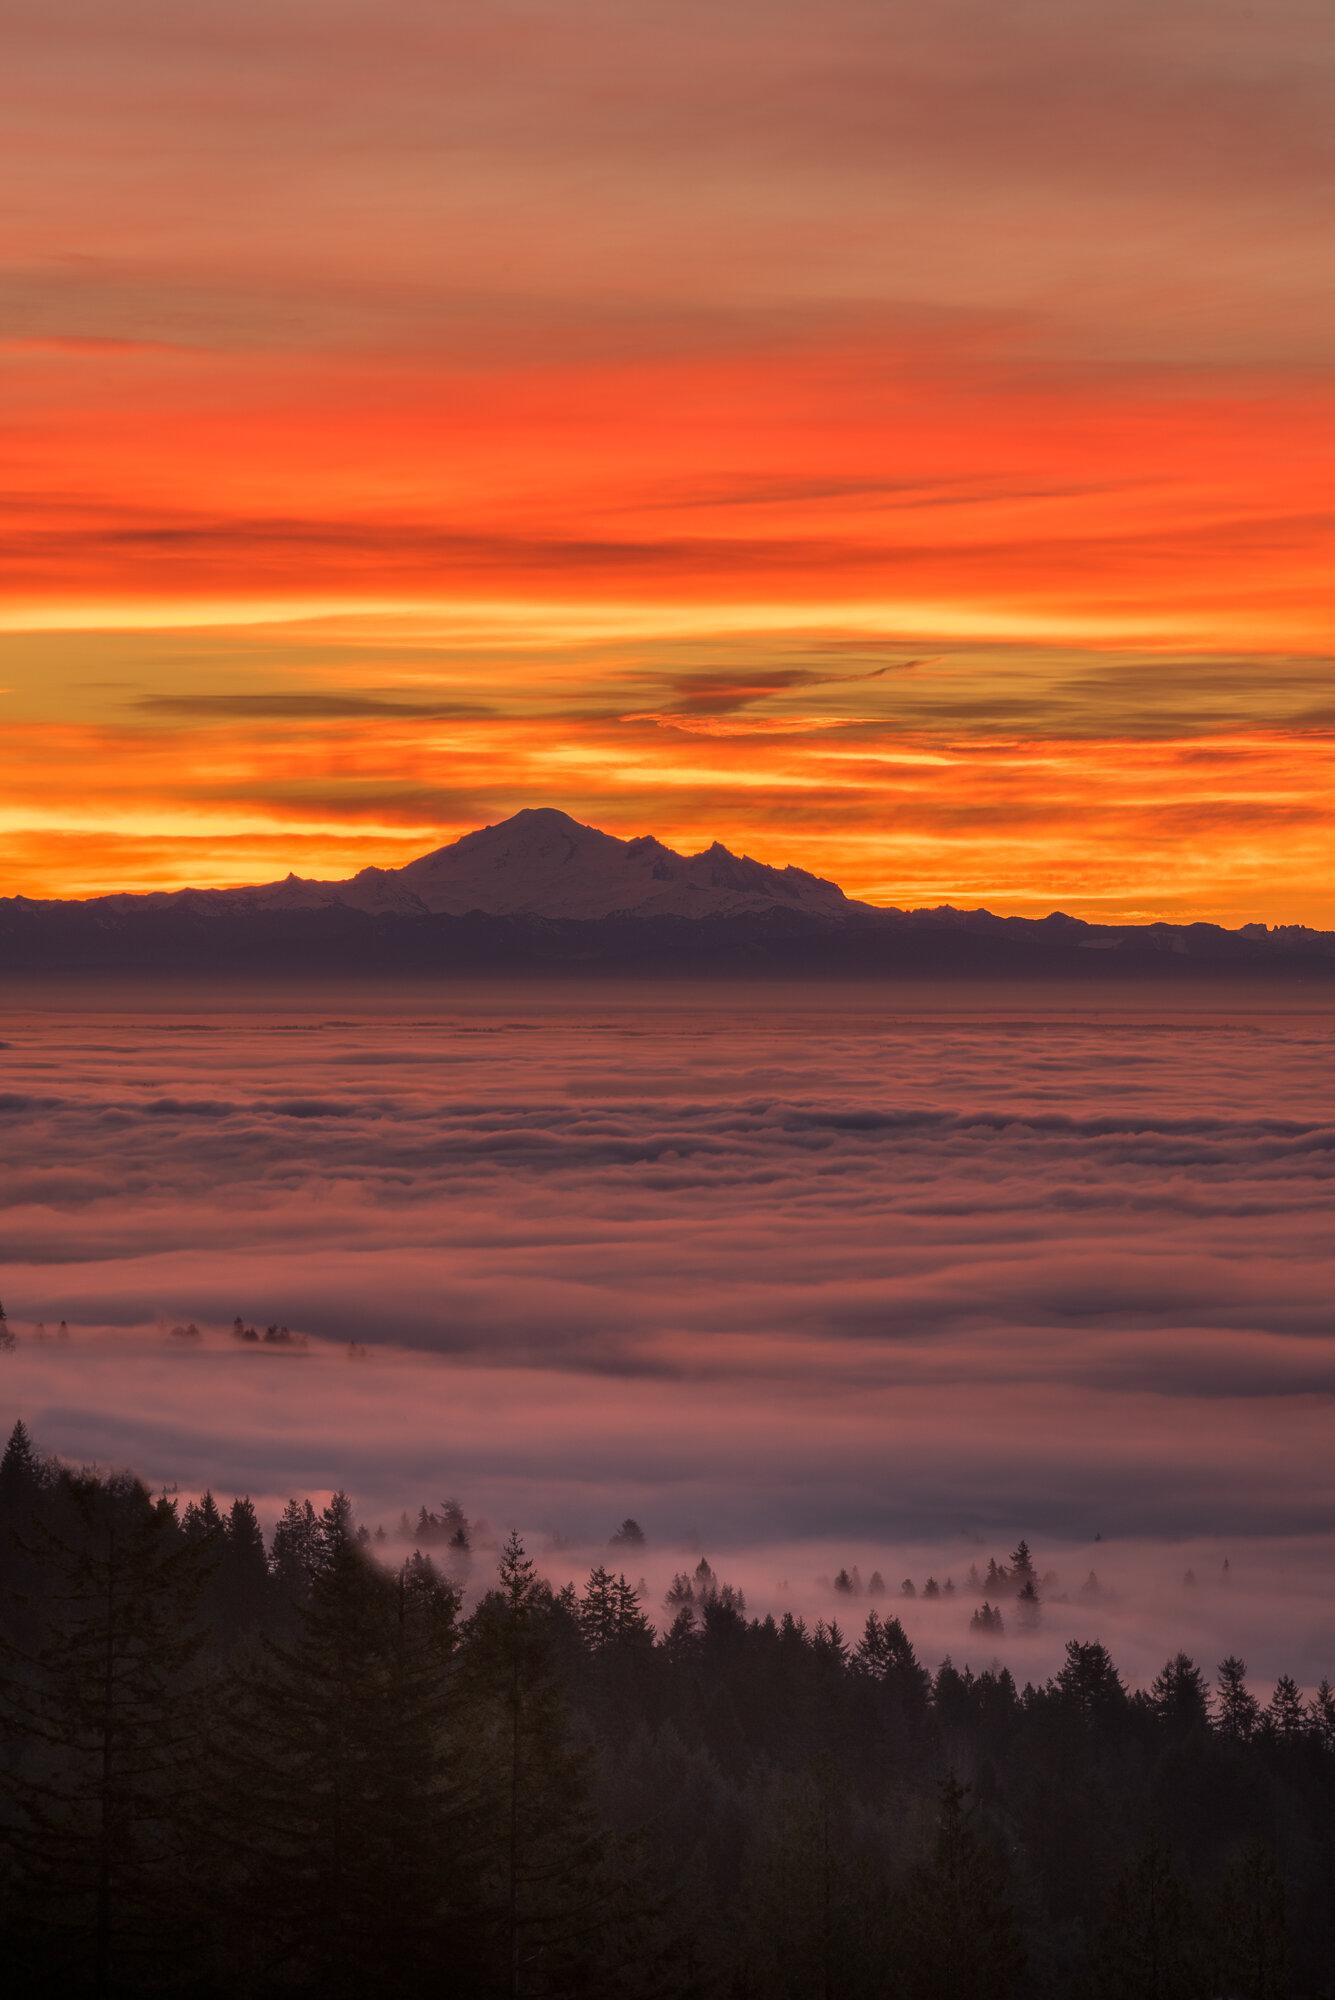 Vancouver Fog Photography: 'Mount Baker'